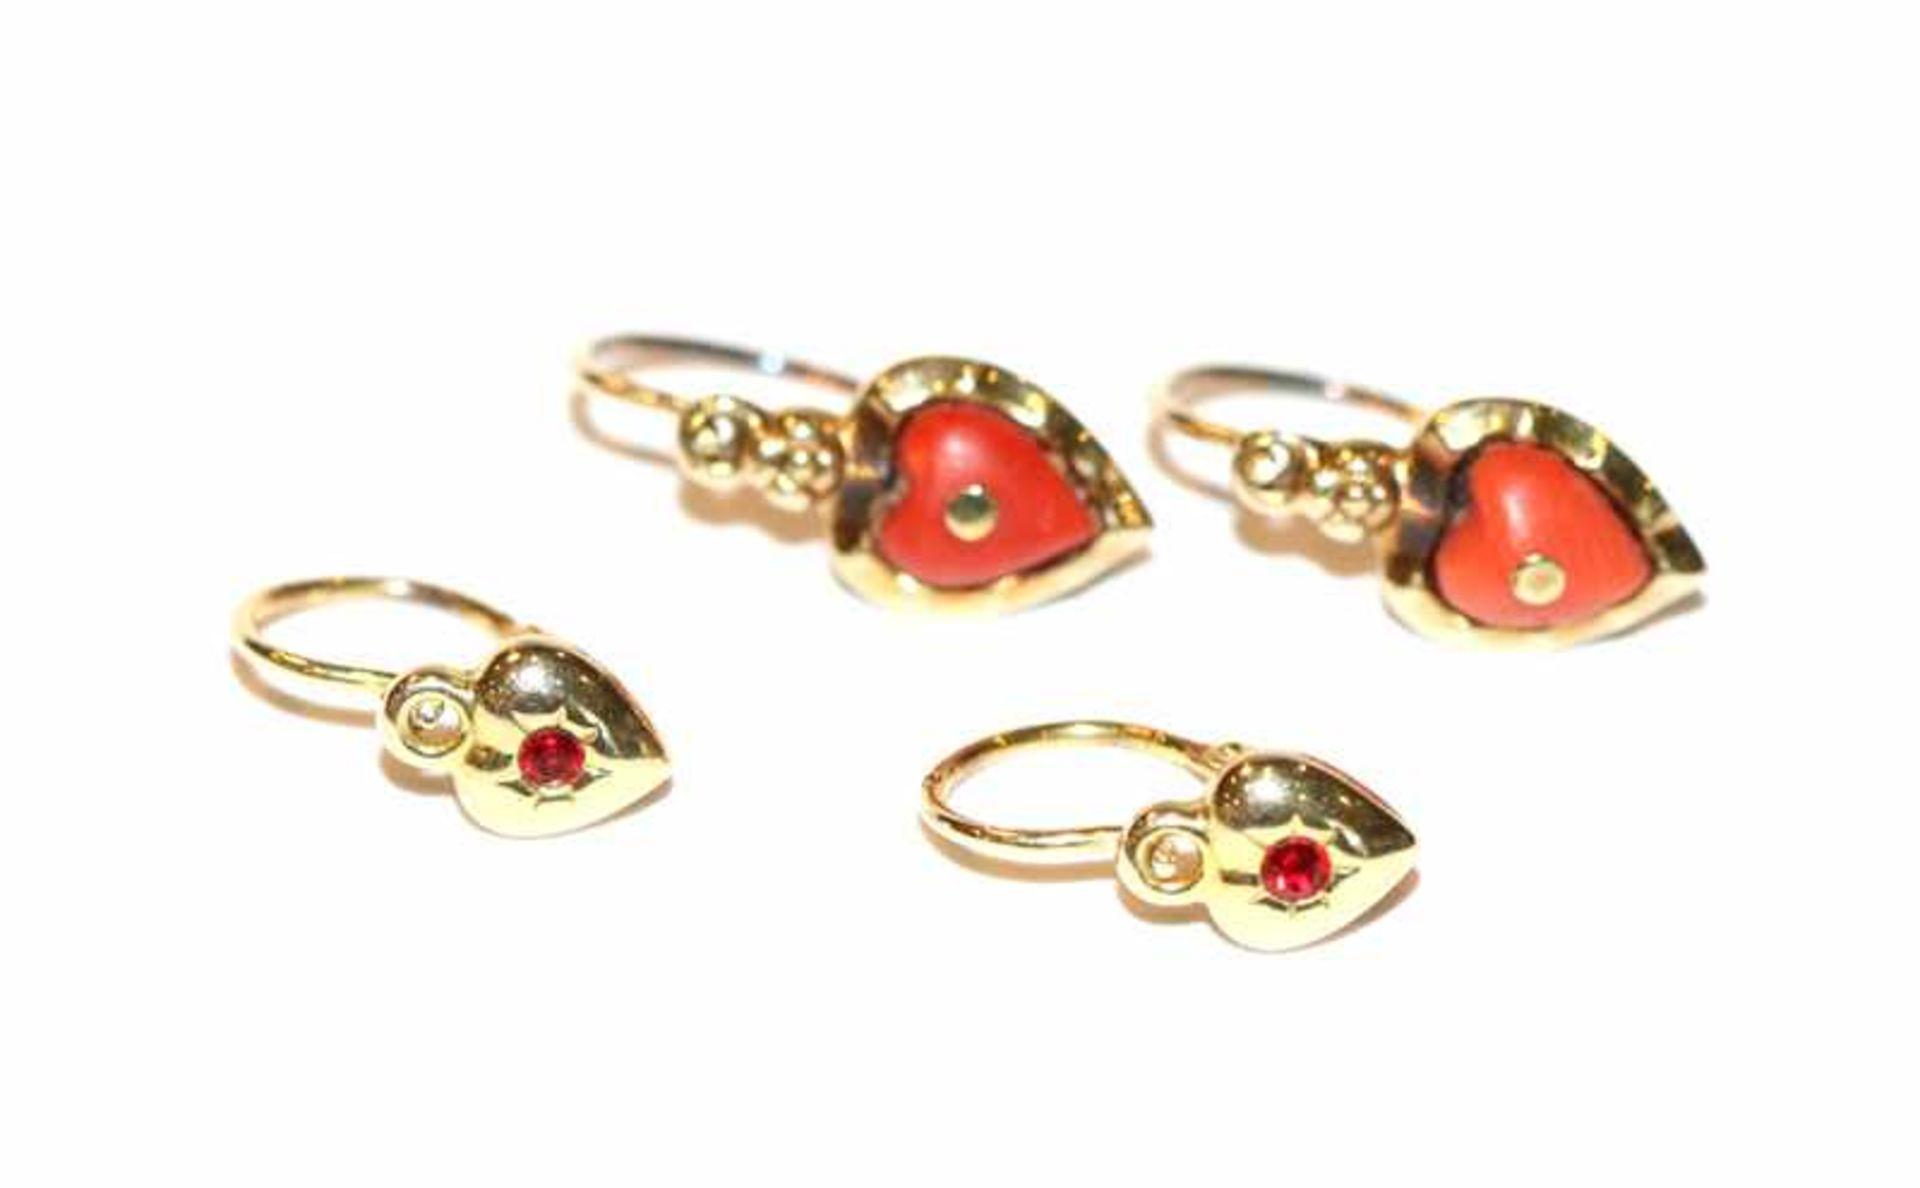 Los 34 - Paar 14 k Gelbgold Kinder-Ohrhänger mit rotem Farbstein und Paar 8 k Kinder-Ohrhänger mit Koralle,